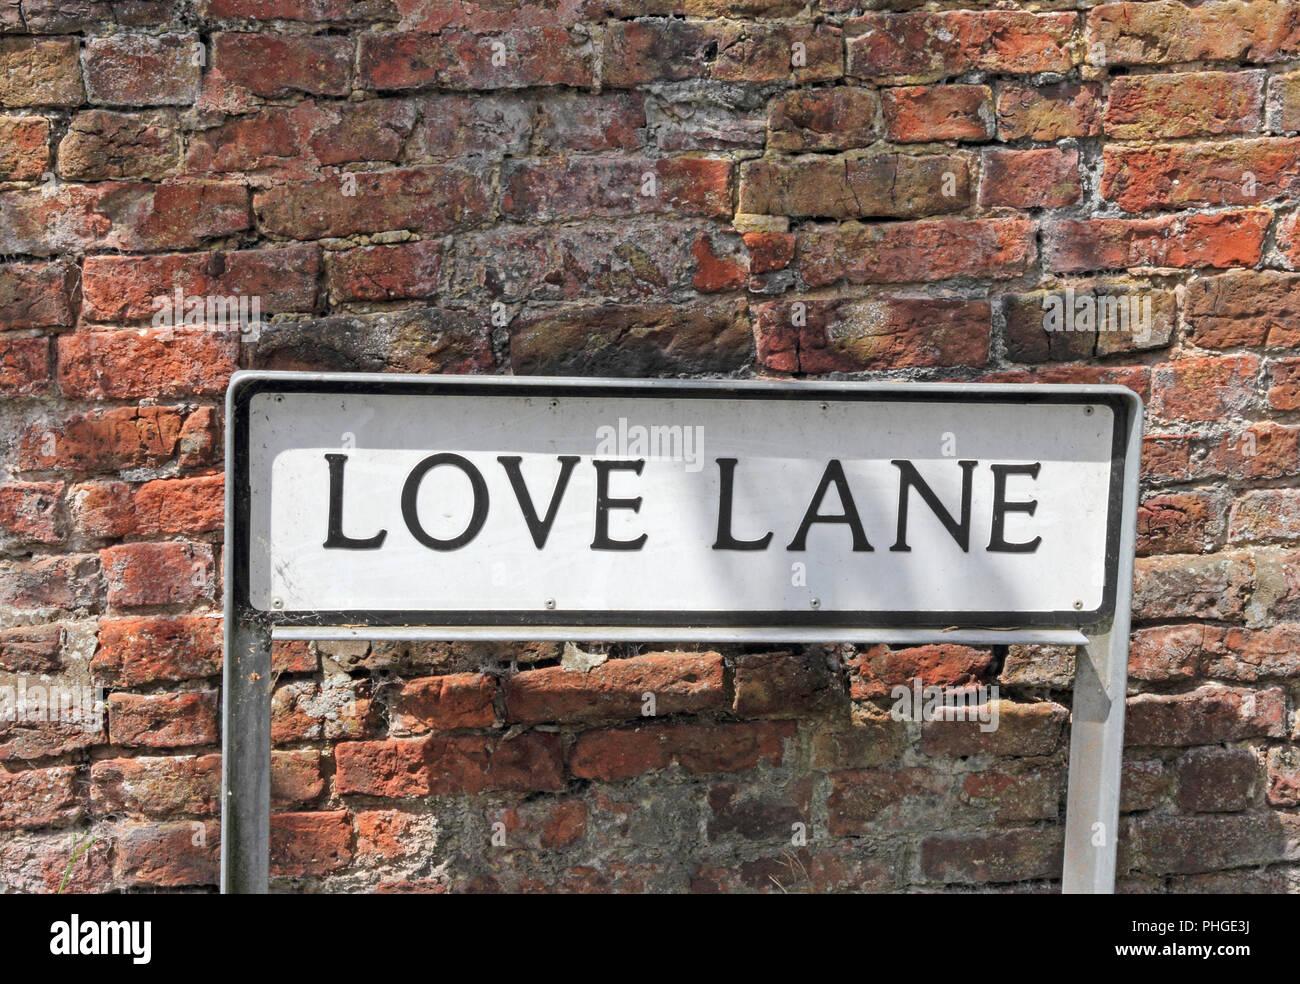 Love Lane street sign - Stock Image